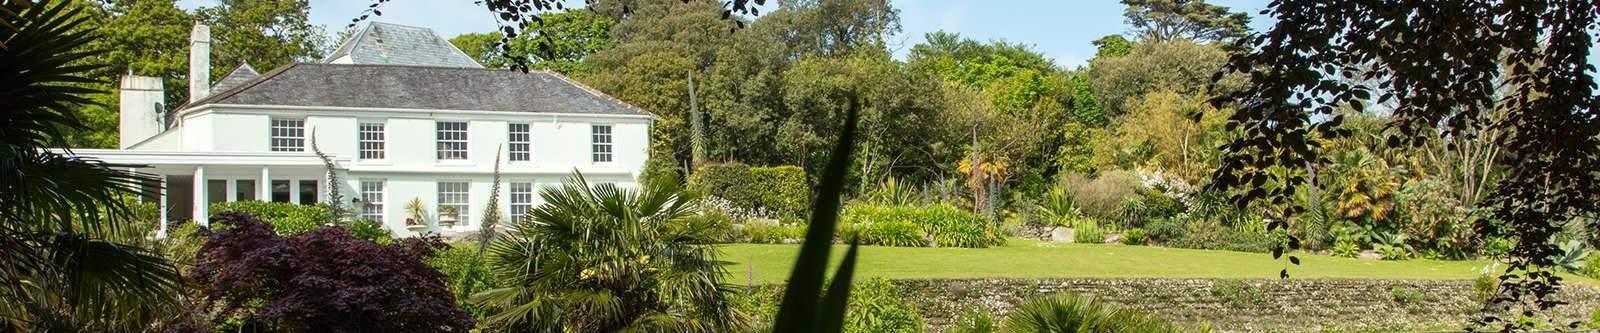 Trebah Garden and house